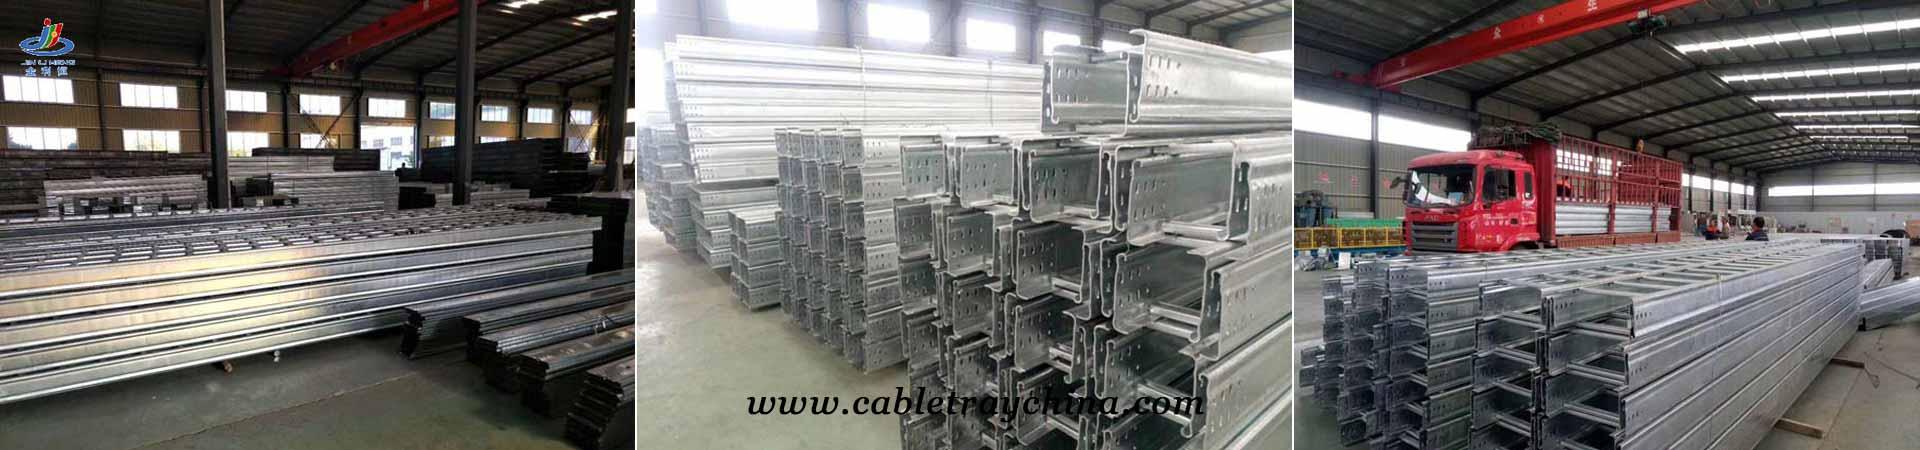 Galvanised cable ladder manufacturer